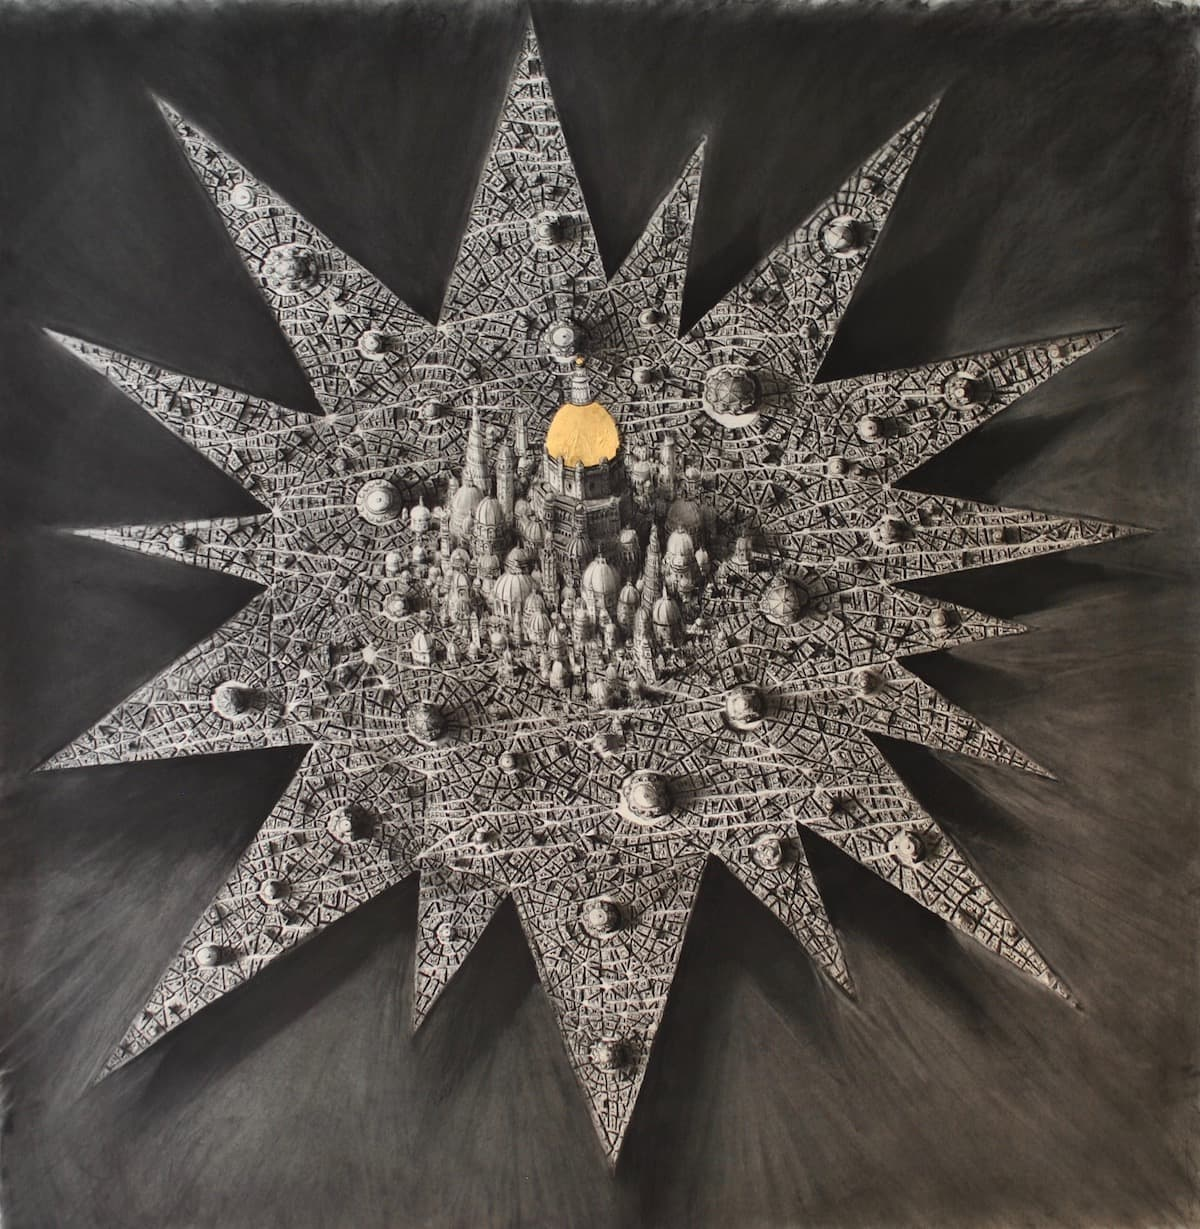 Benjamin Sack - Labyrinths